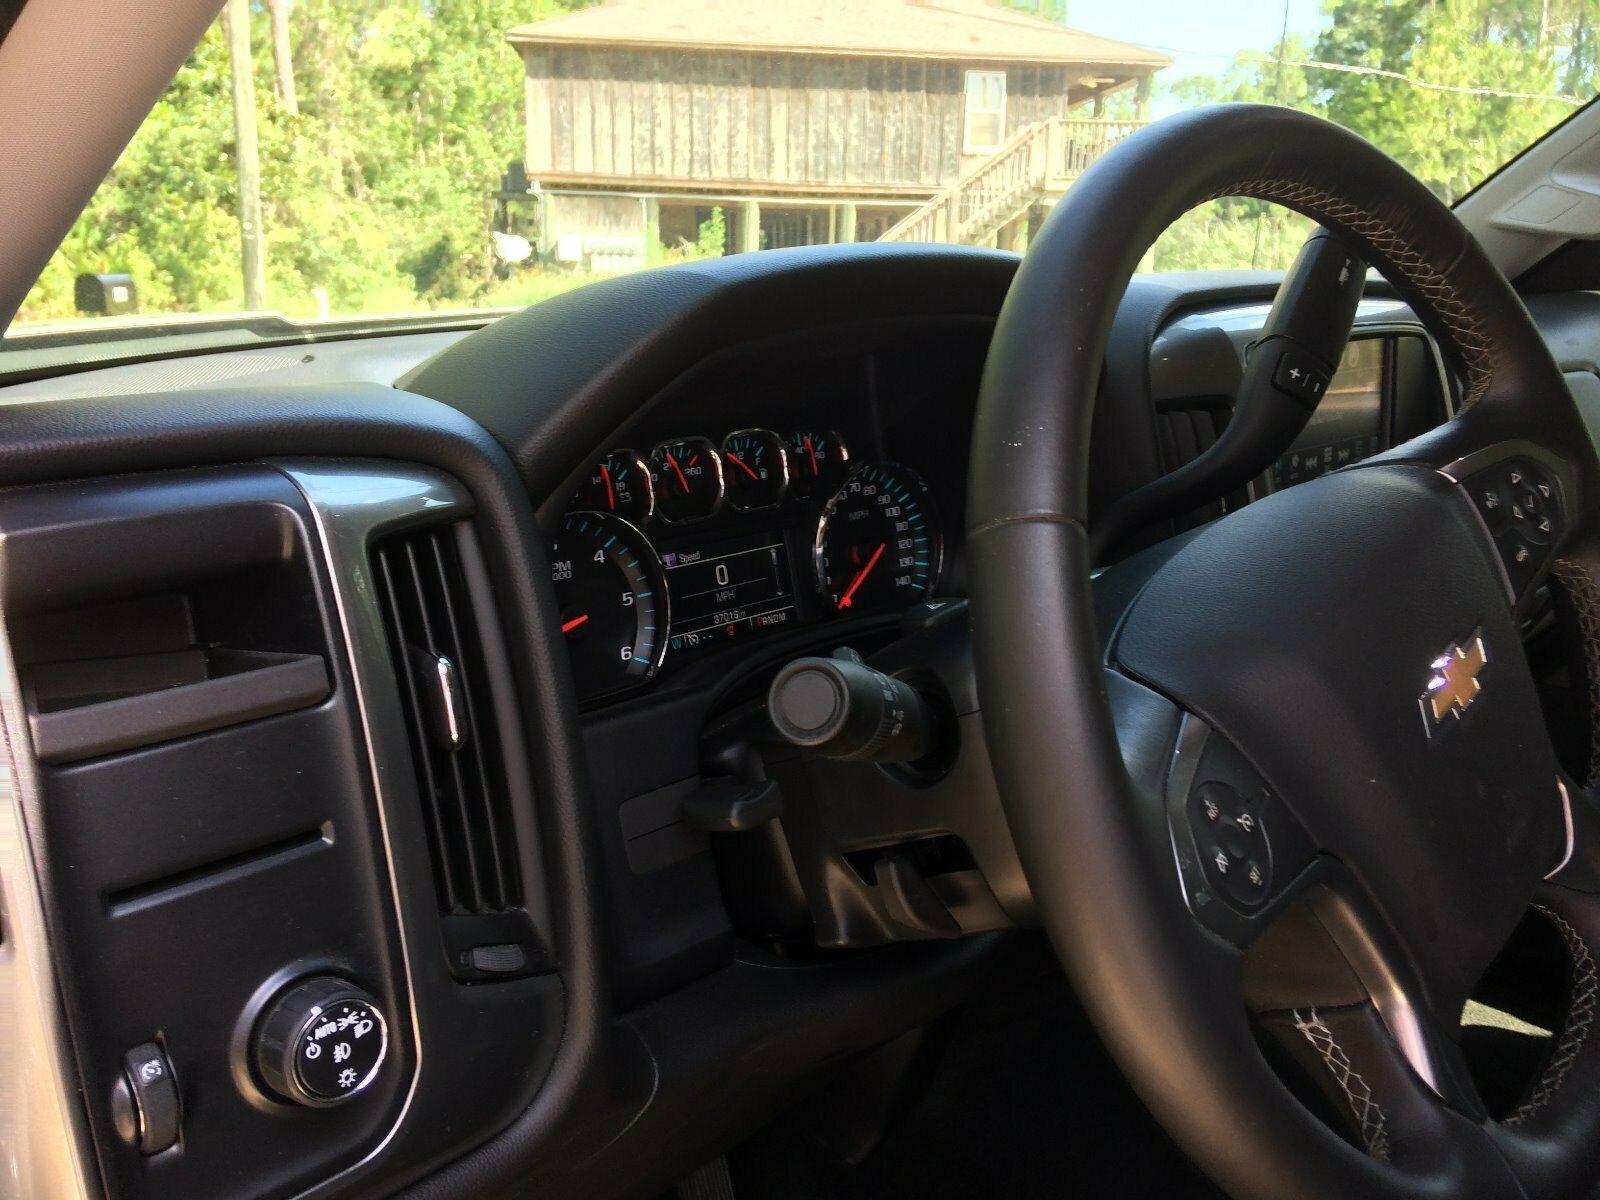 low mileage 2016 Chevrolet Silverado 1500 LT lifted